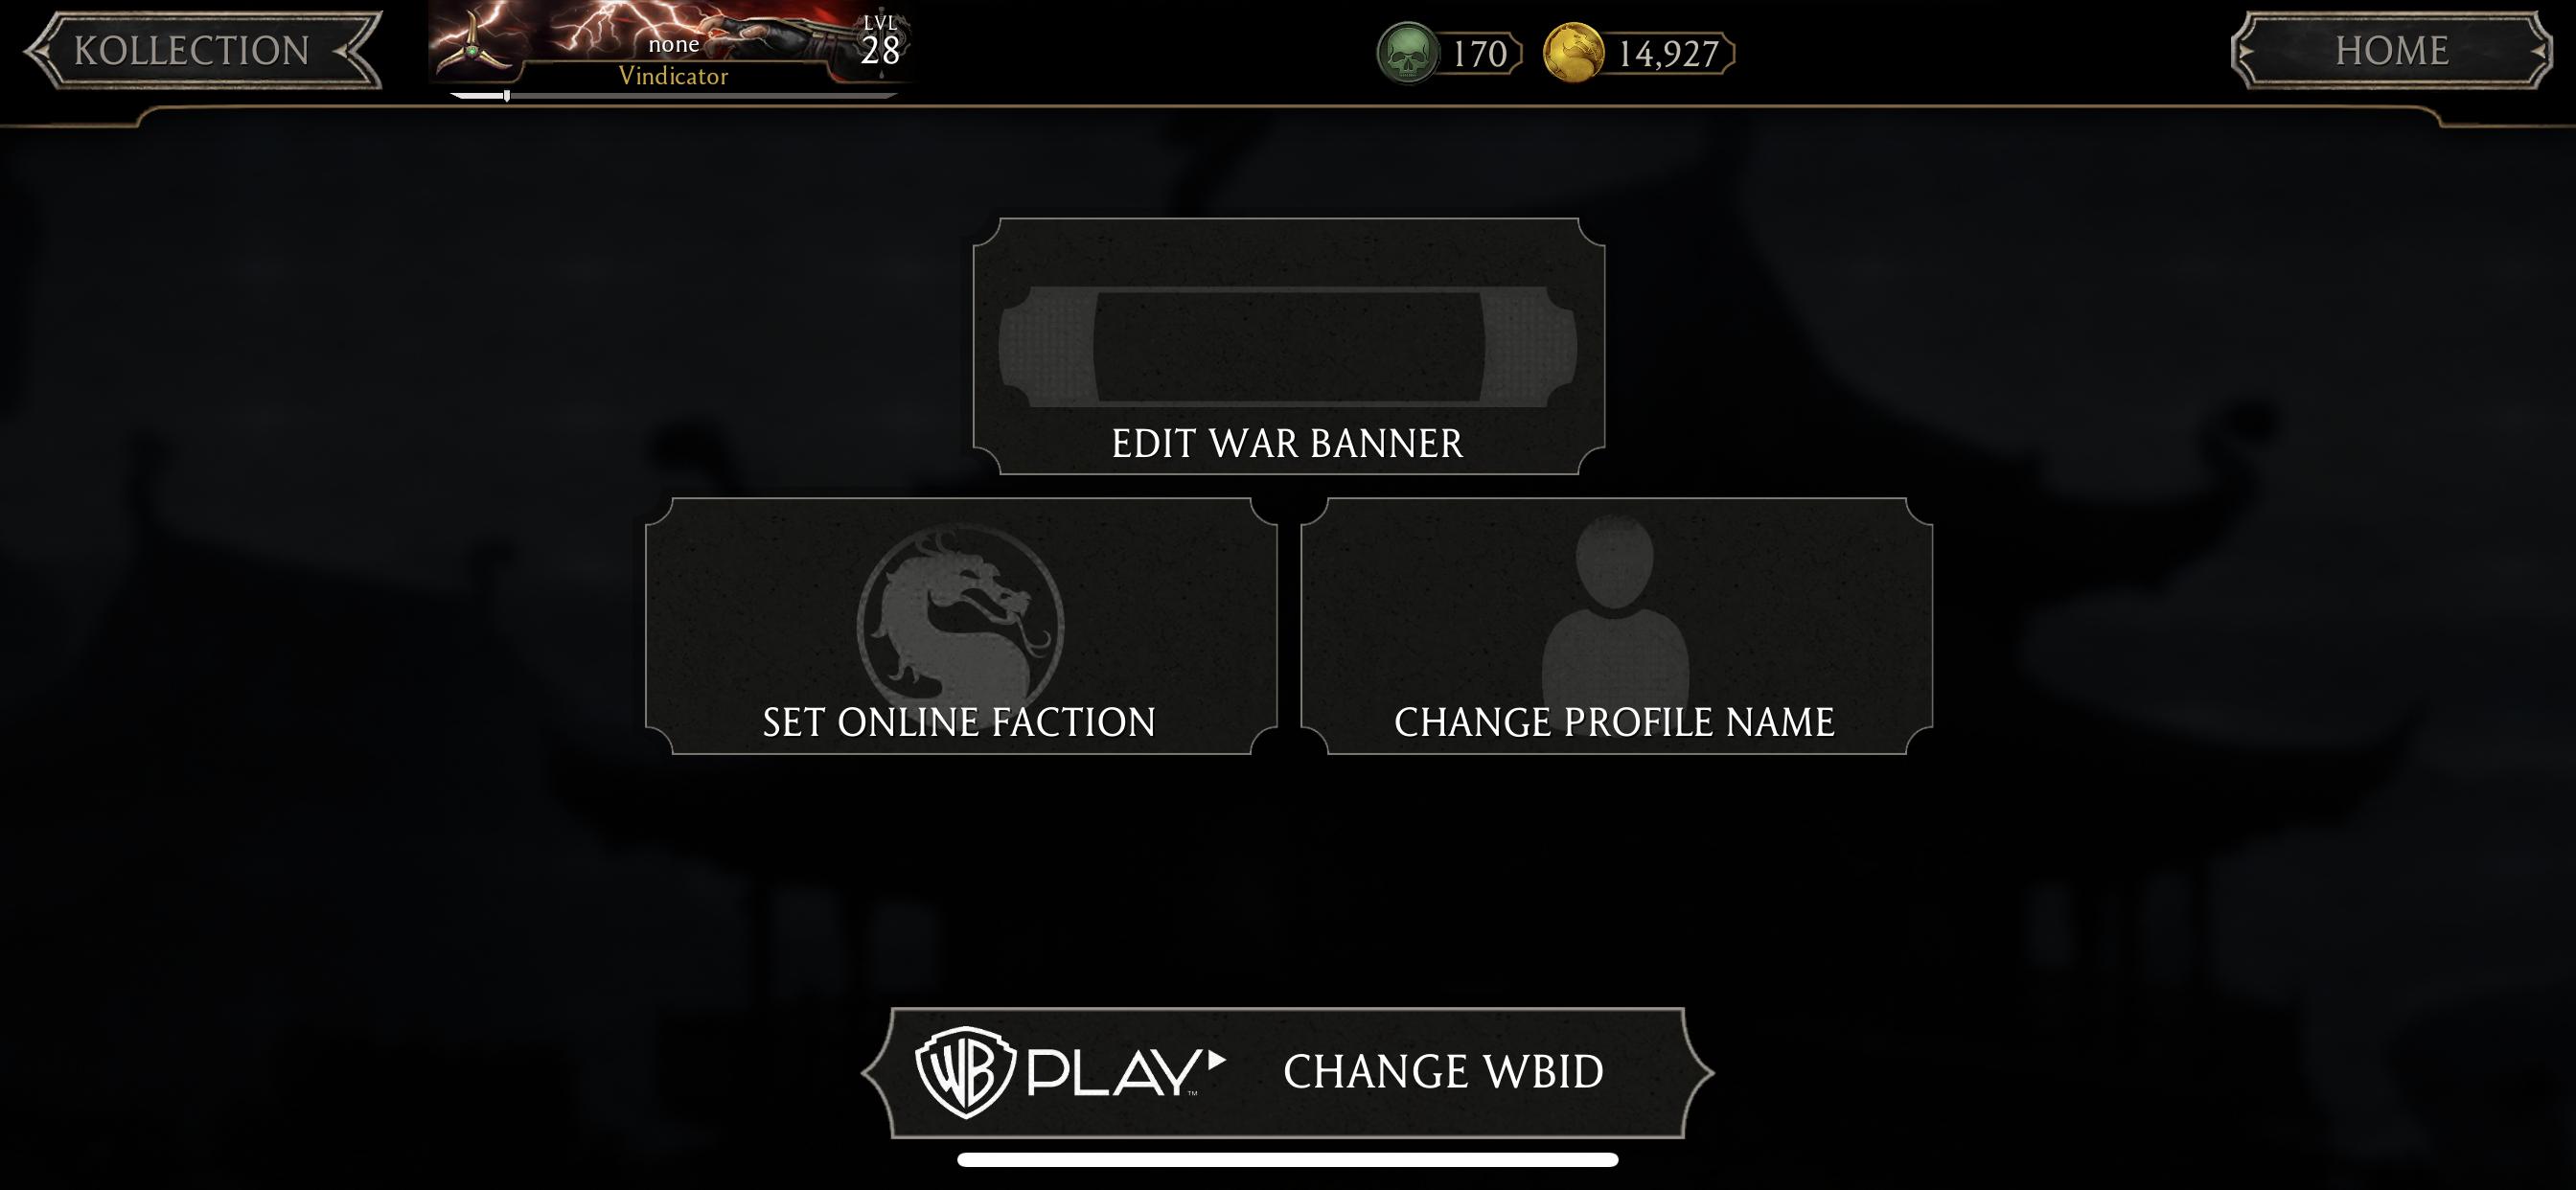 How do I change my Profile name in MK Mobile? – Mortal Kombat Games